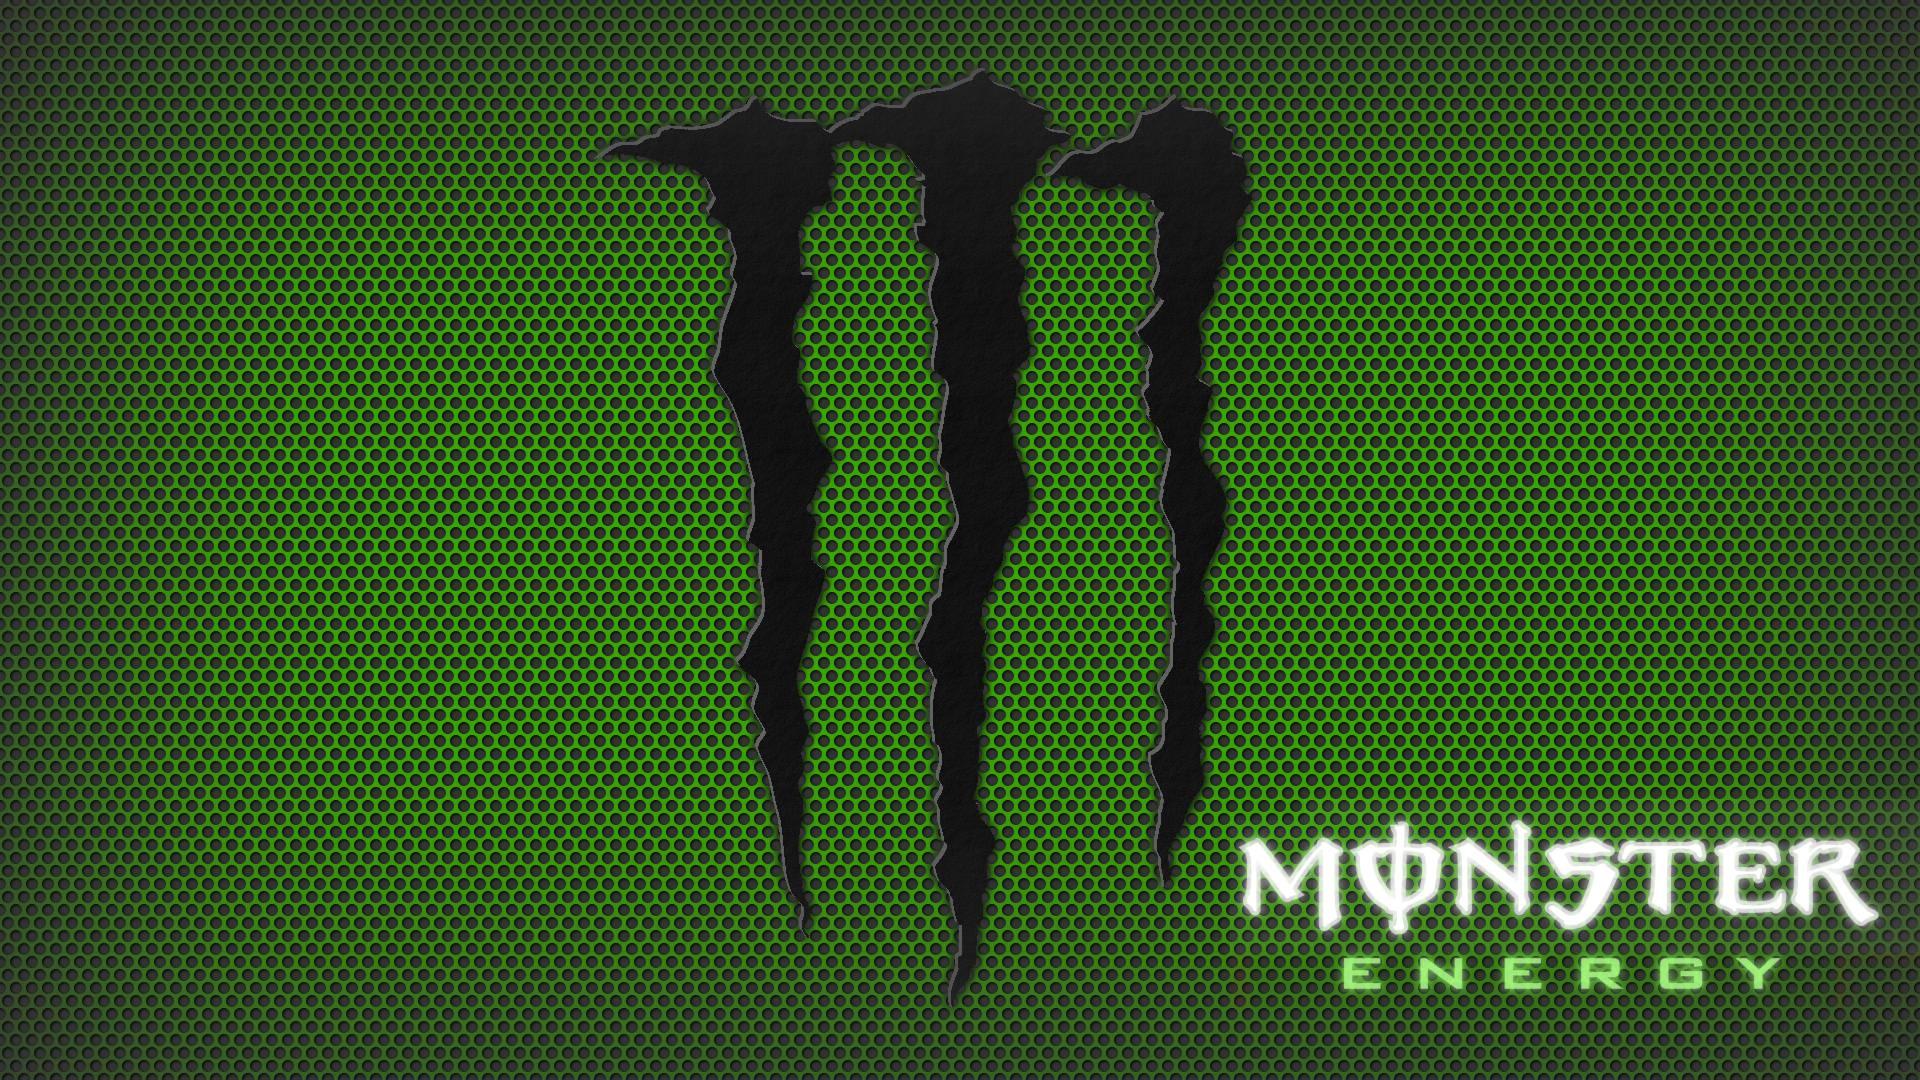 Monster Energy Hd Wallpaper In Desktop Downloadshdwallpaper Car ...